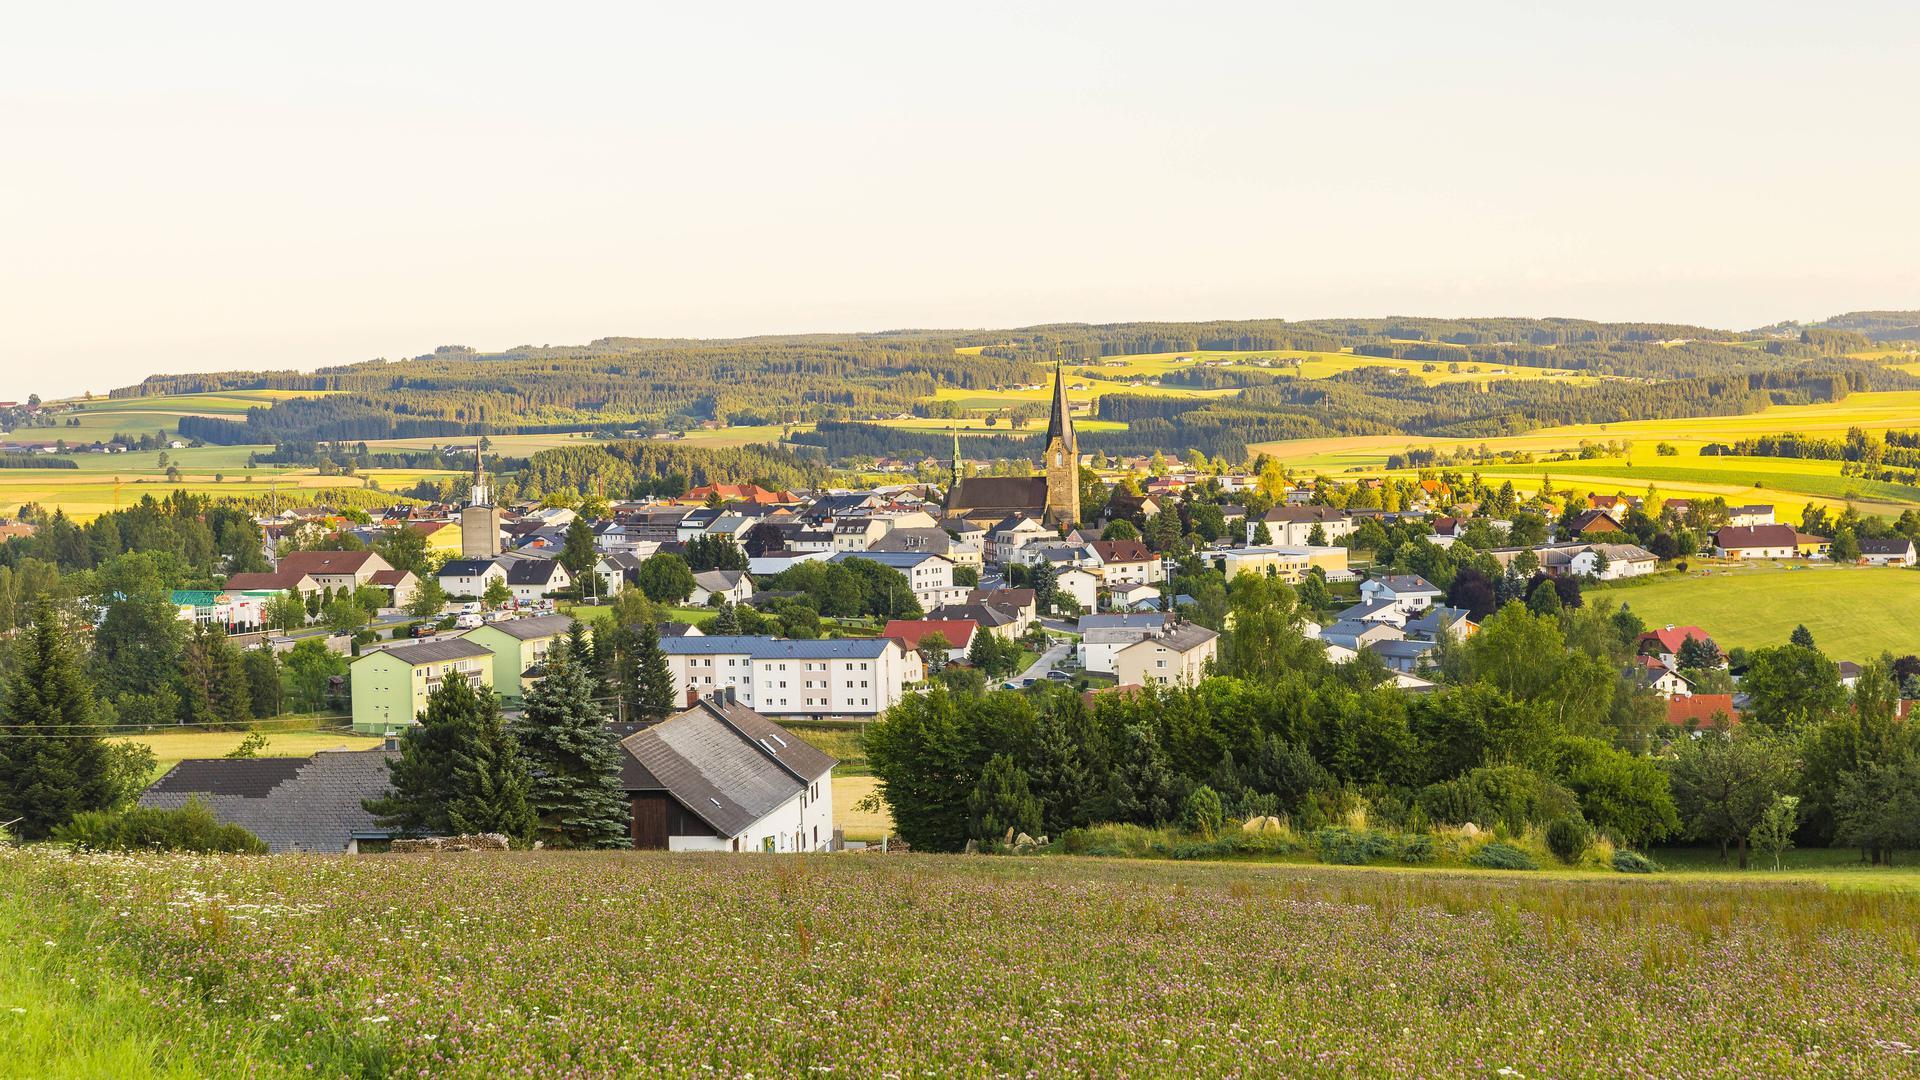 Austria, Muehlviertel, Bad Leonfelden, spa town PUBLICATIONxINxGERxSUIxAUTxHUNxONLY AIF00607